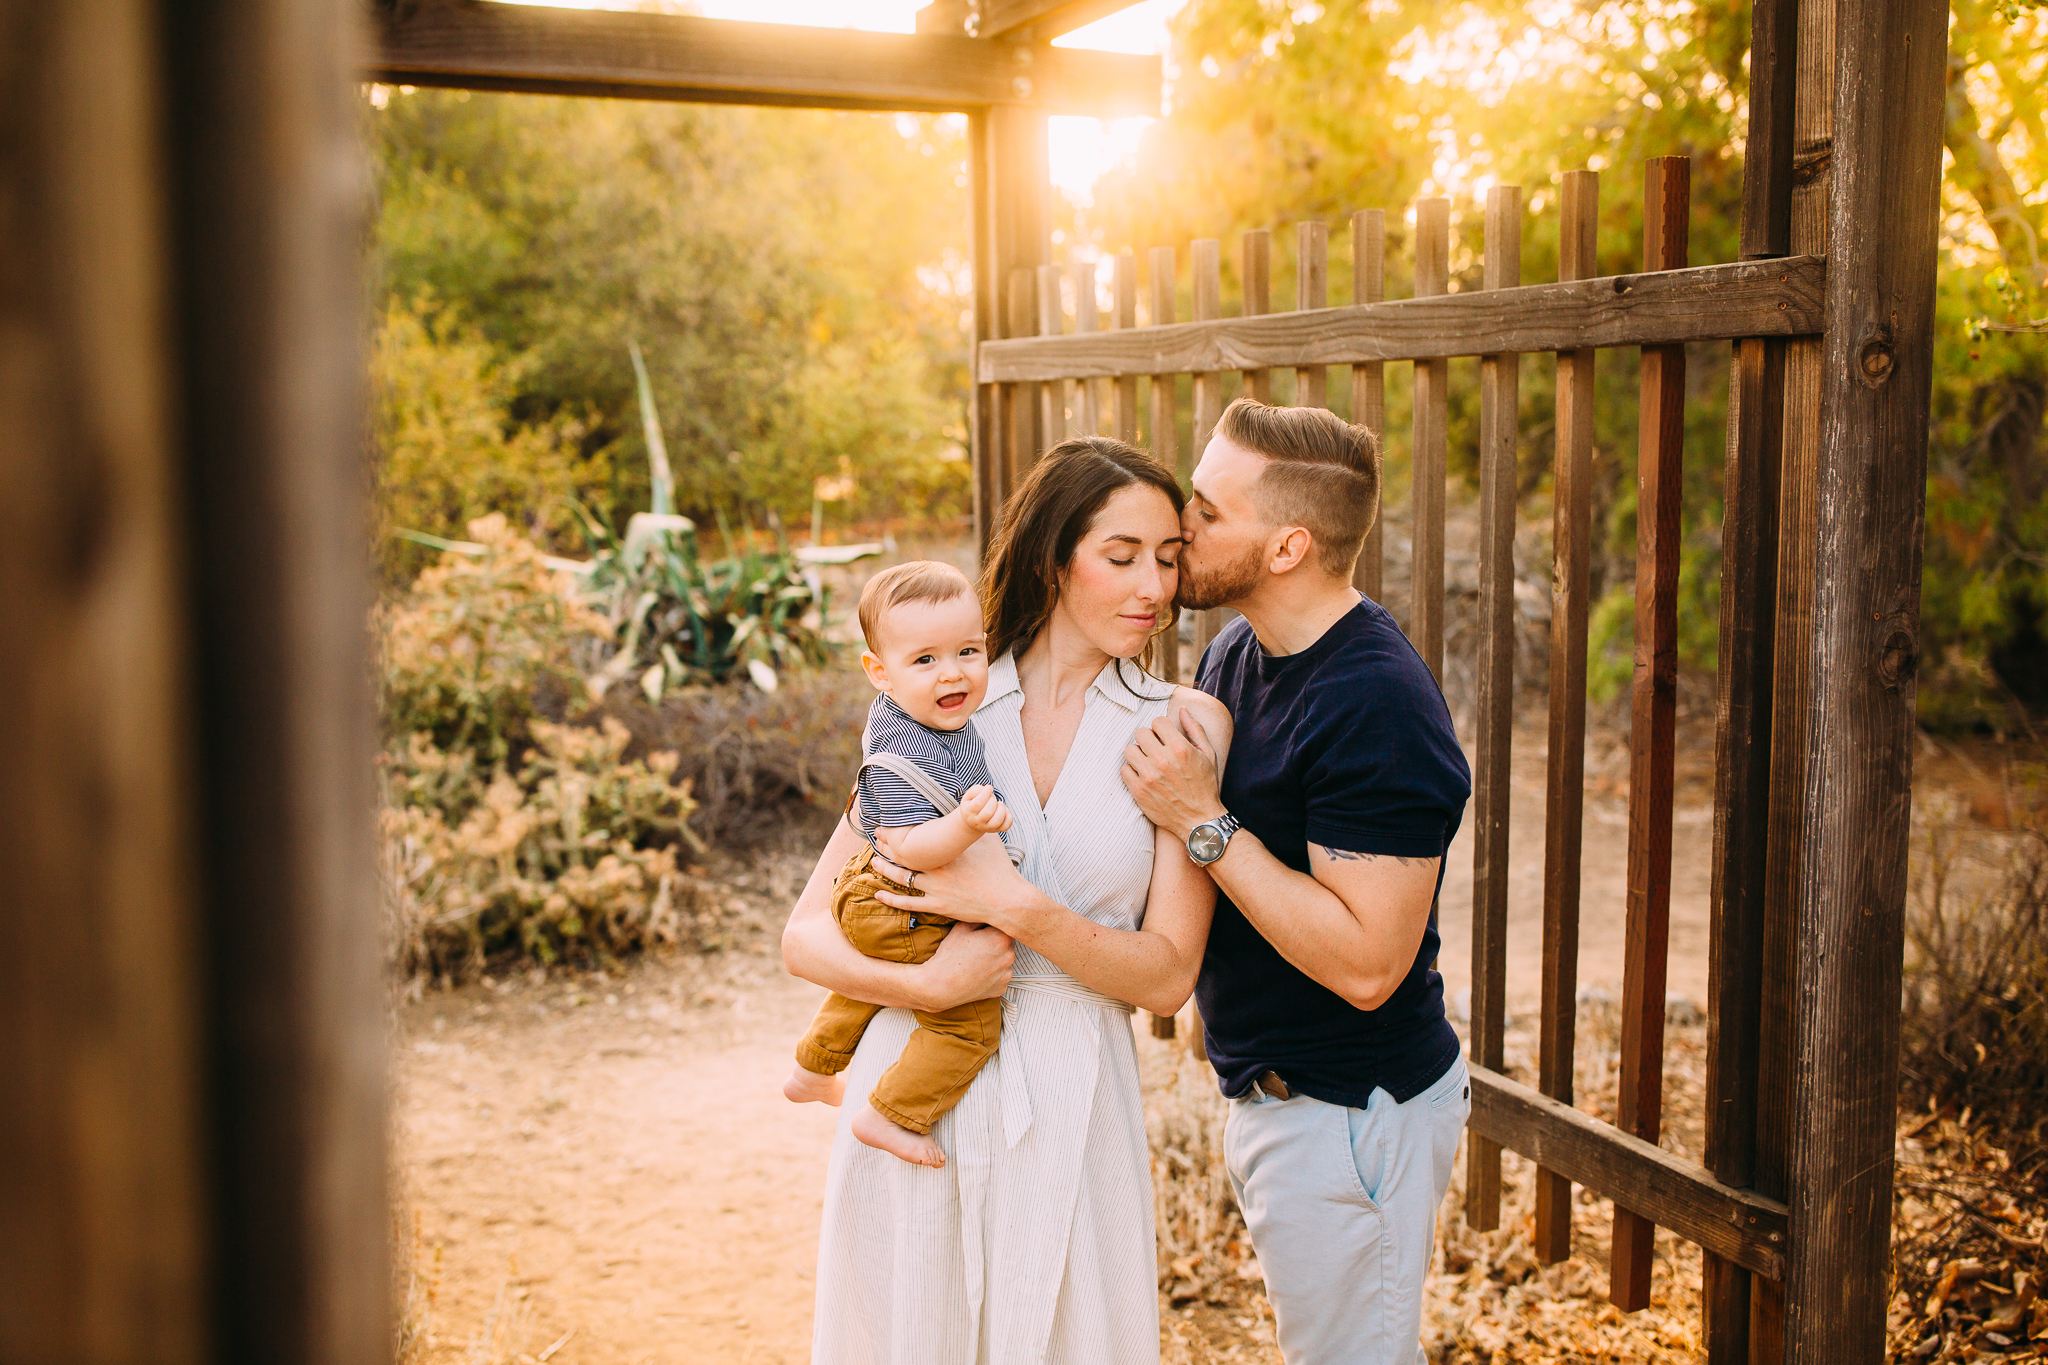 irvinefamilyphotographer-13.jpg